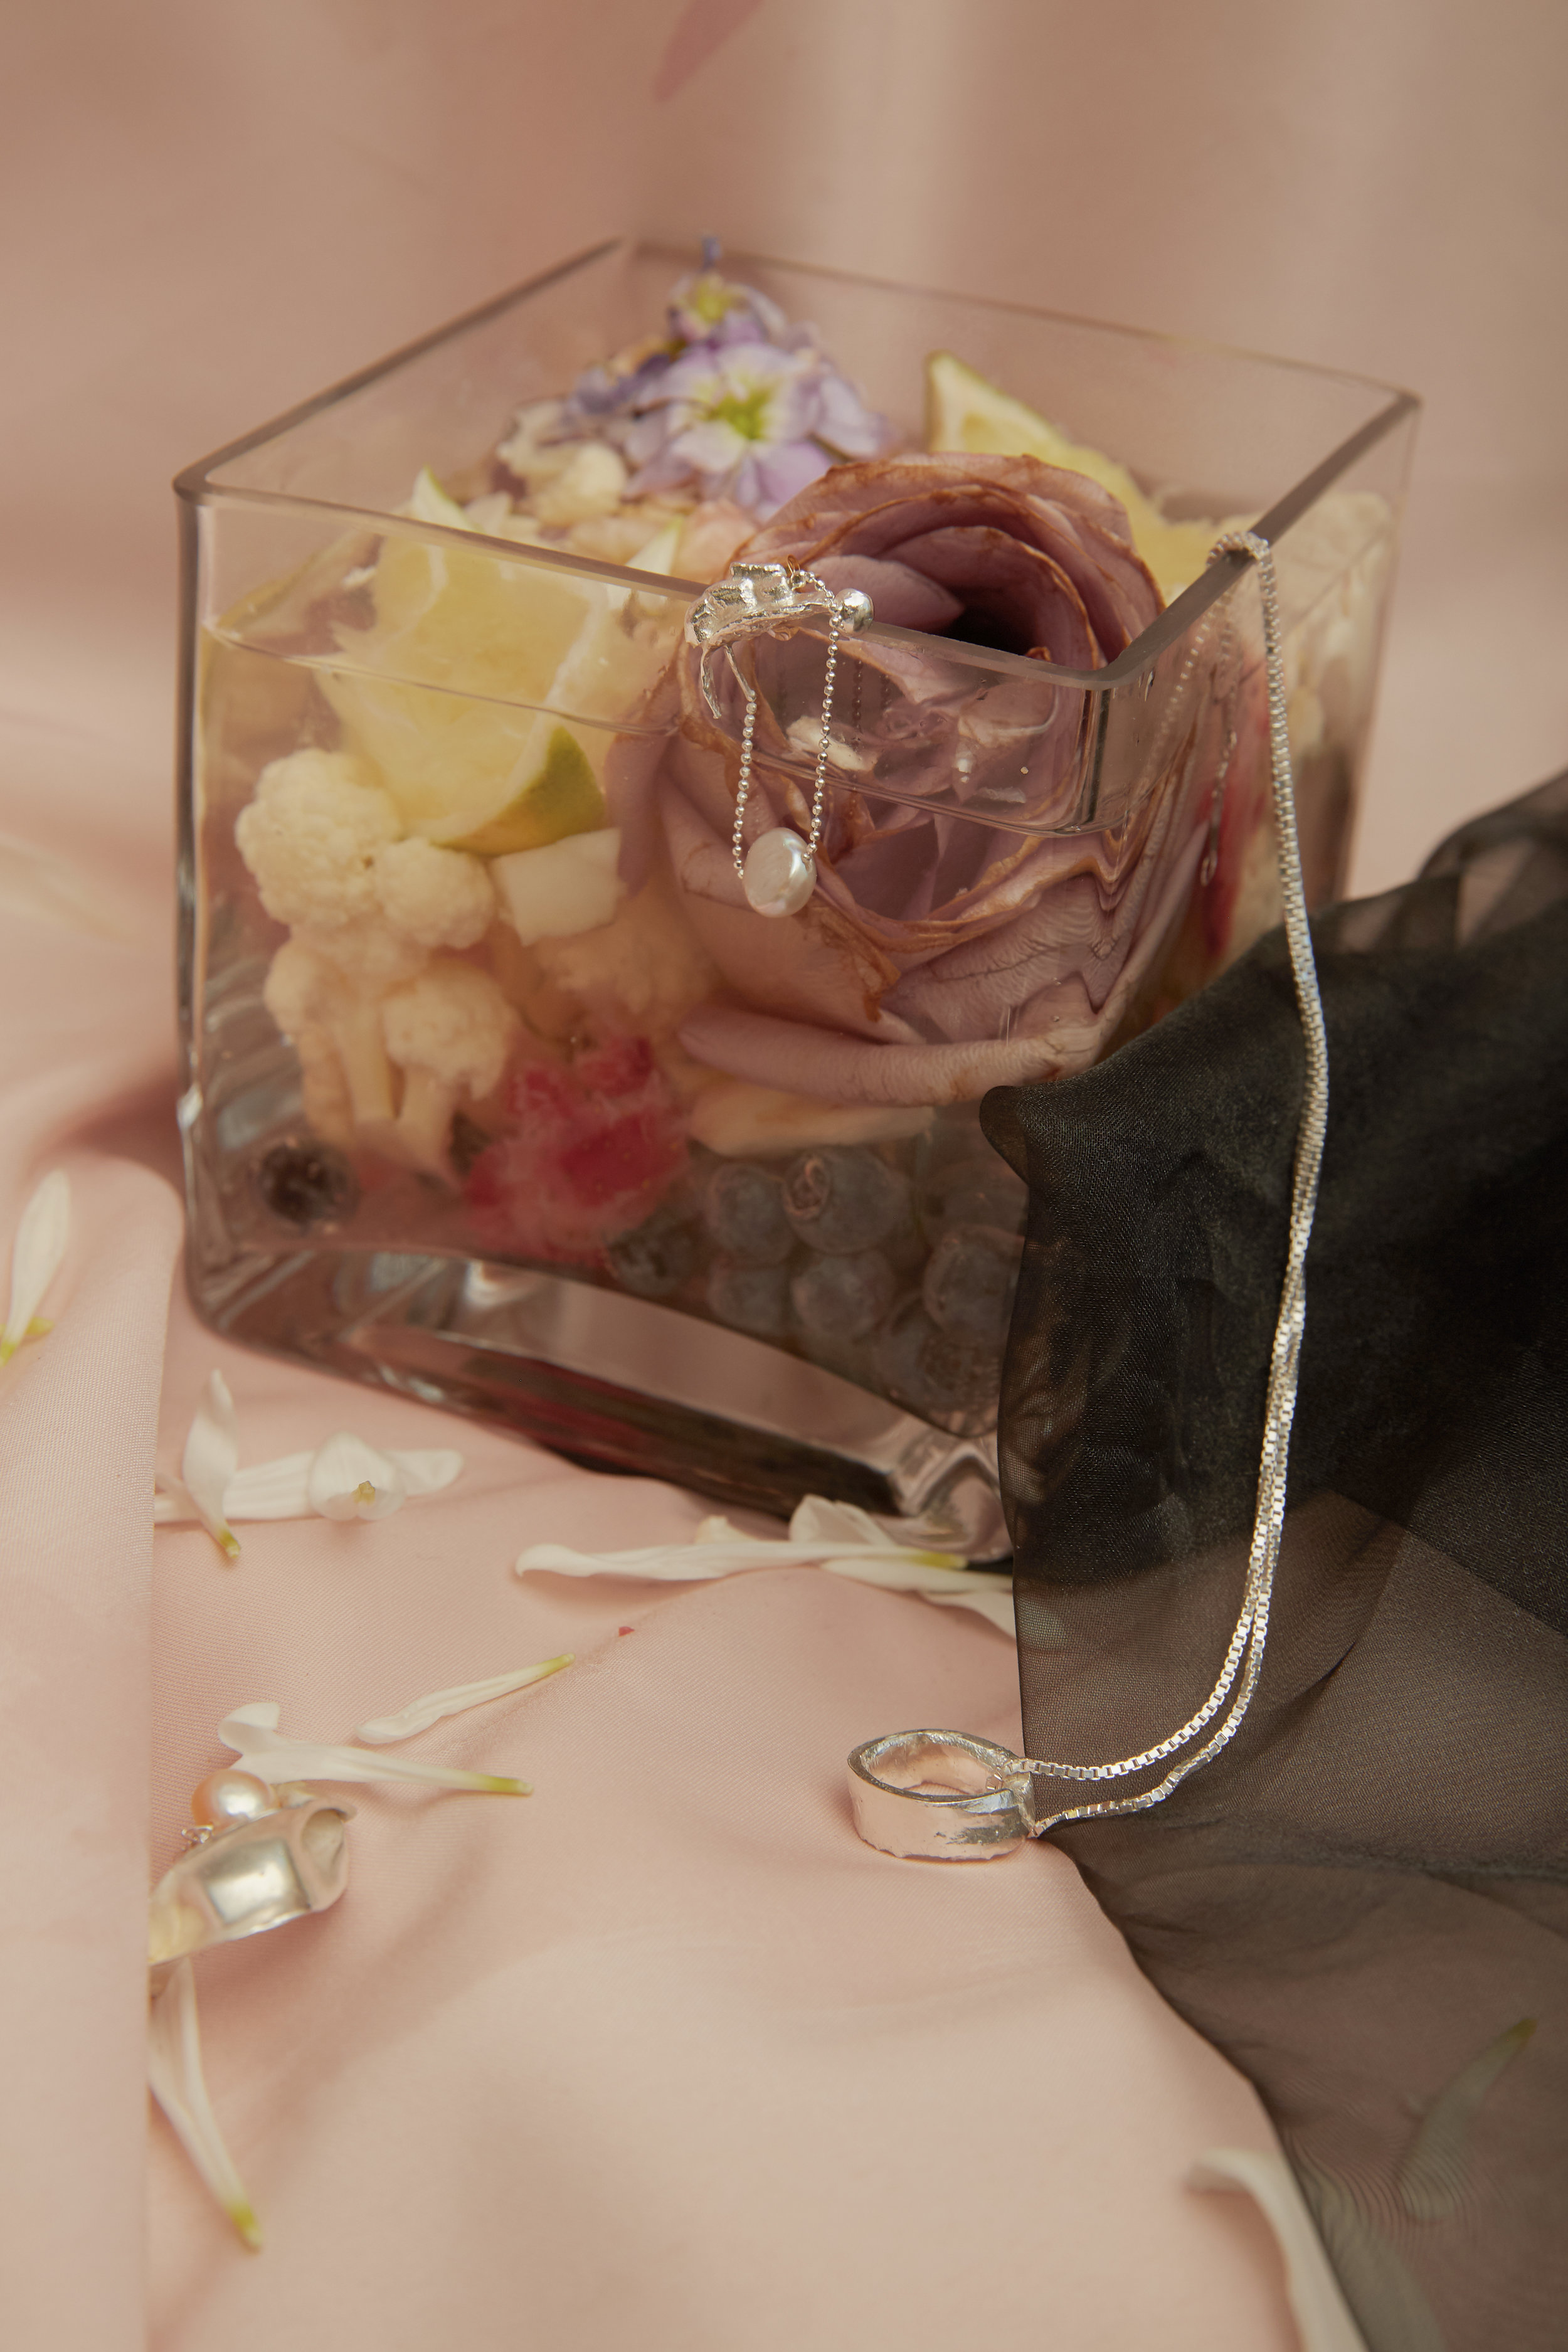 dead flower19106 拷贝.jpg